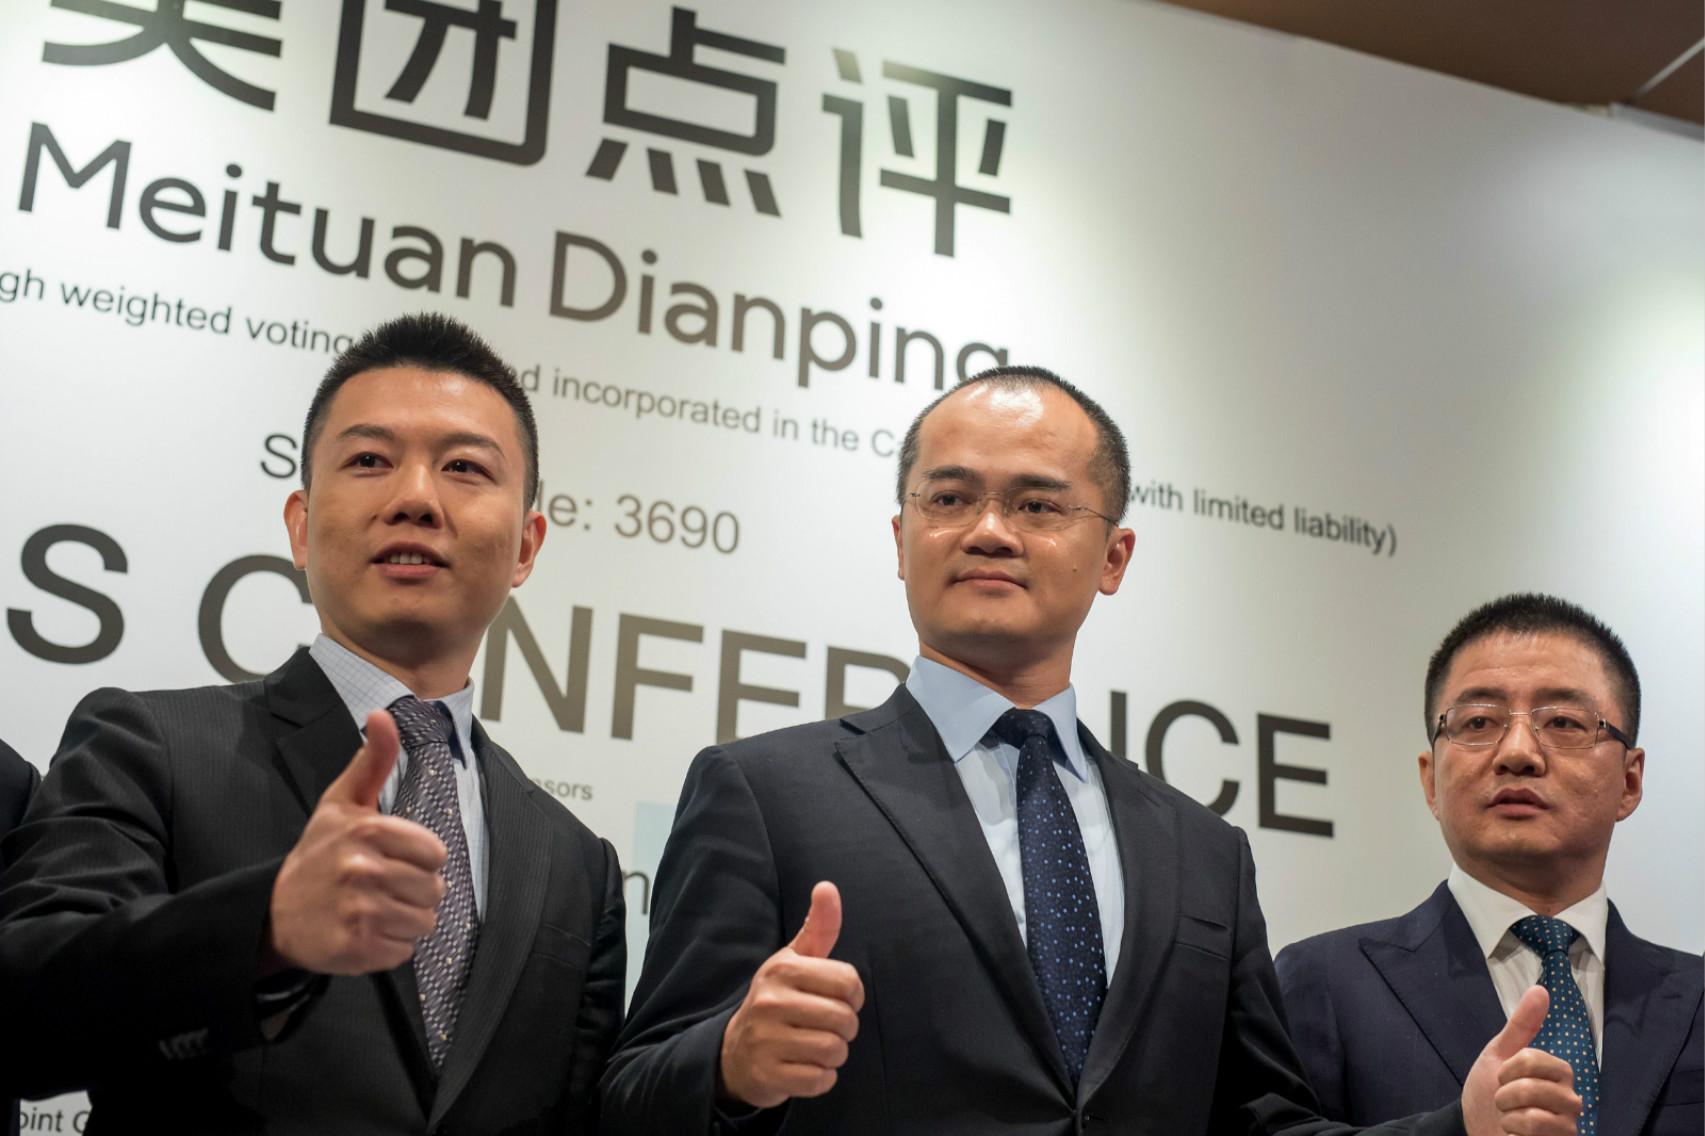 Meituan-Dianping CEO Wang Xing (center) at IPO press conference in Hong Kong. Photo: VCG